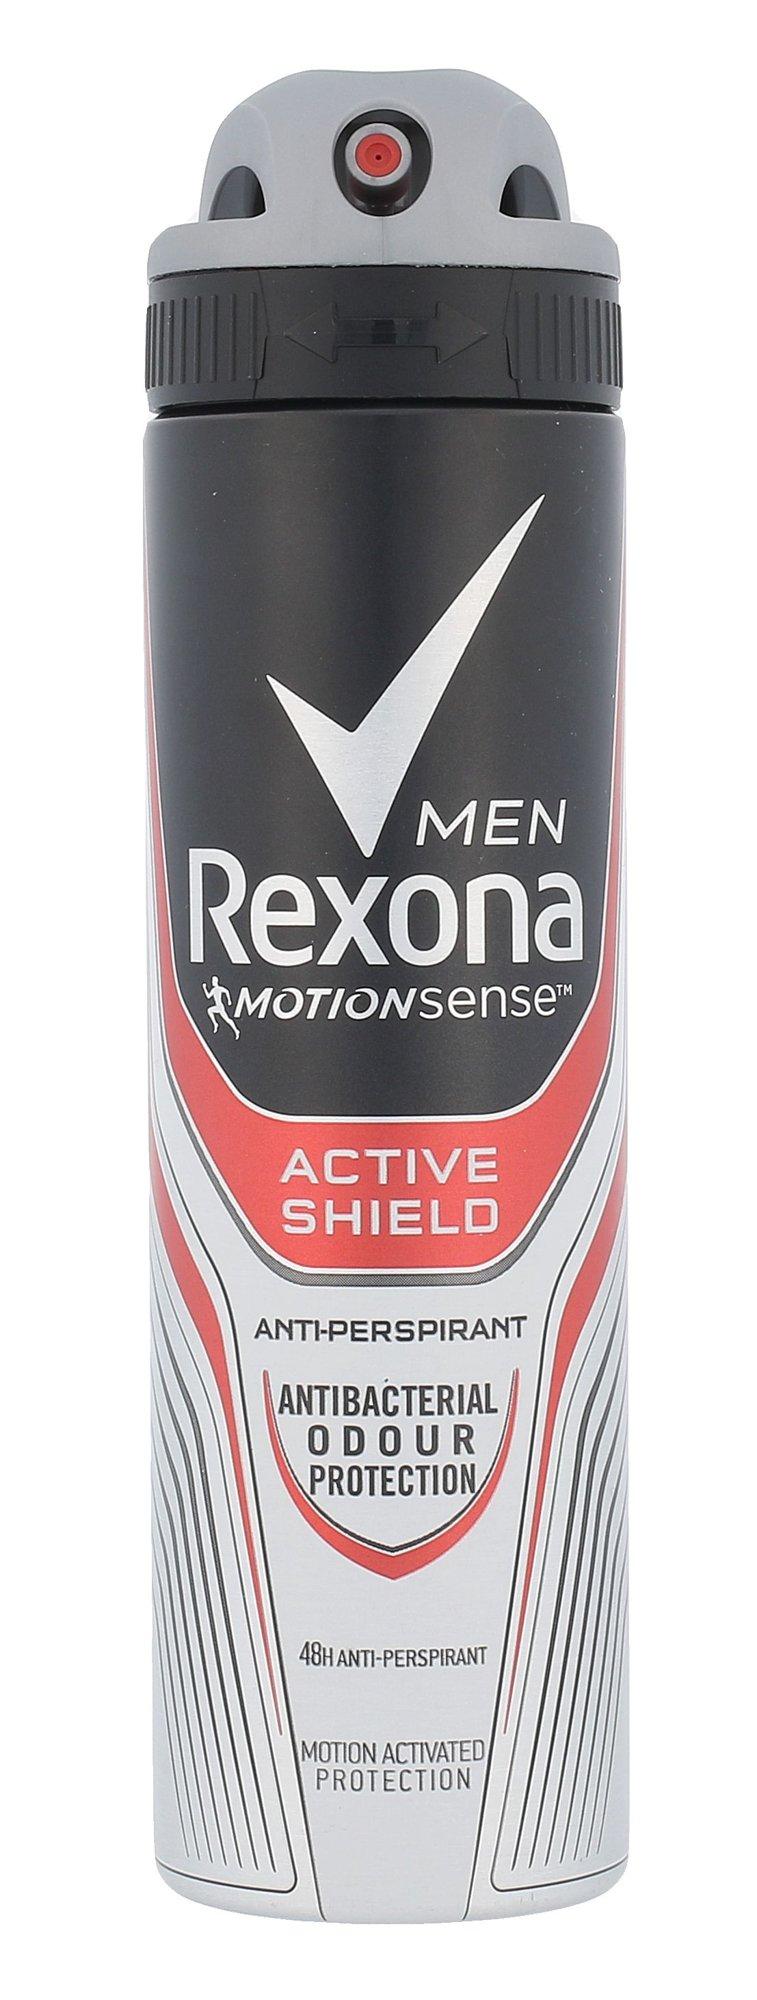 Rexona Men Active Shield 48H Anti-Perspirant Deospray Cosmetic 150ml